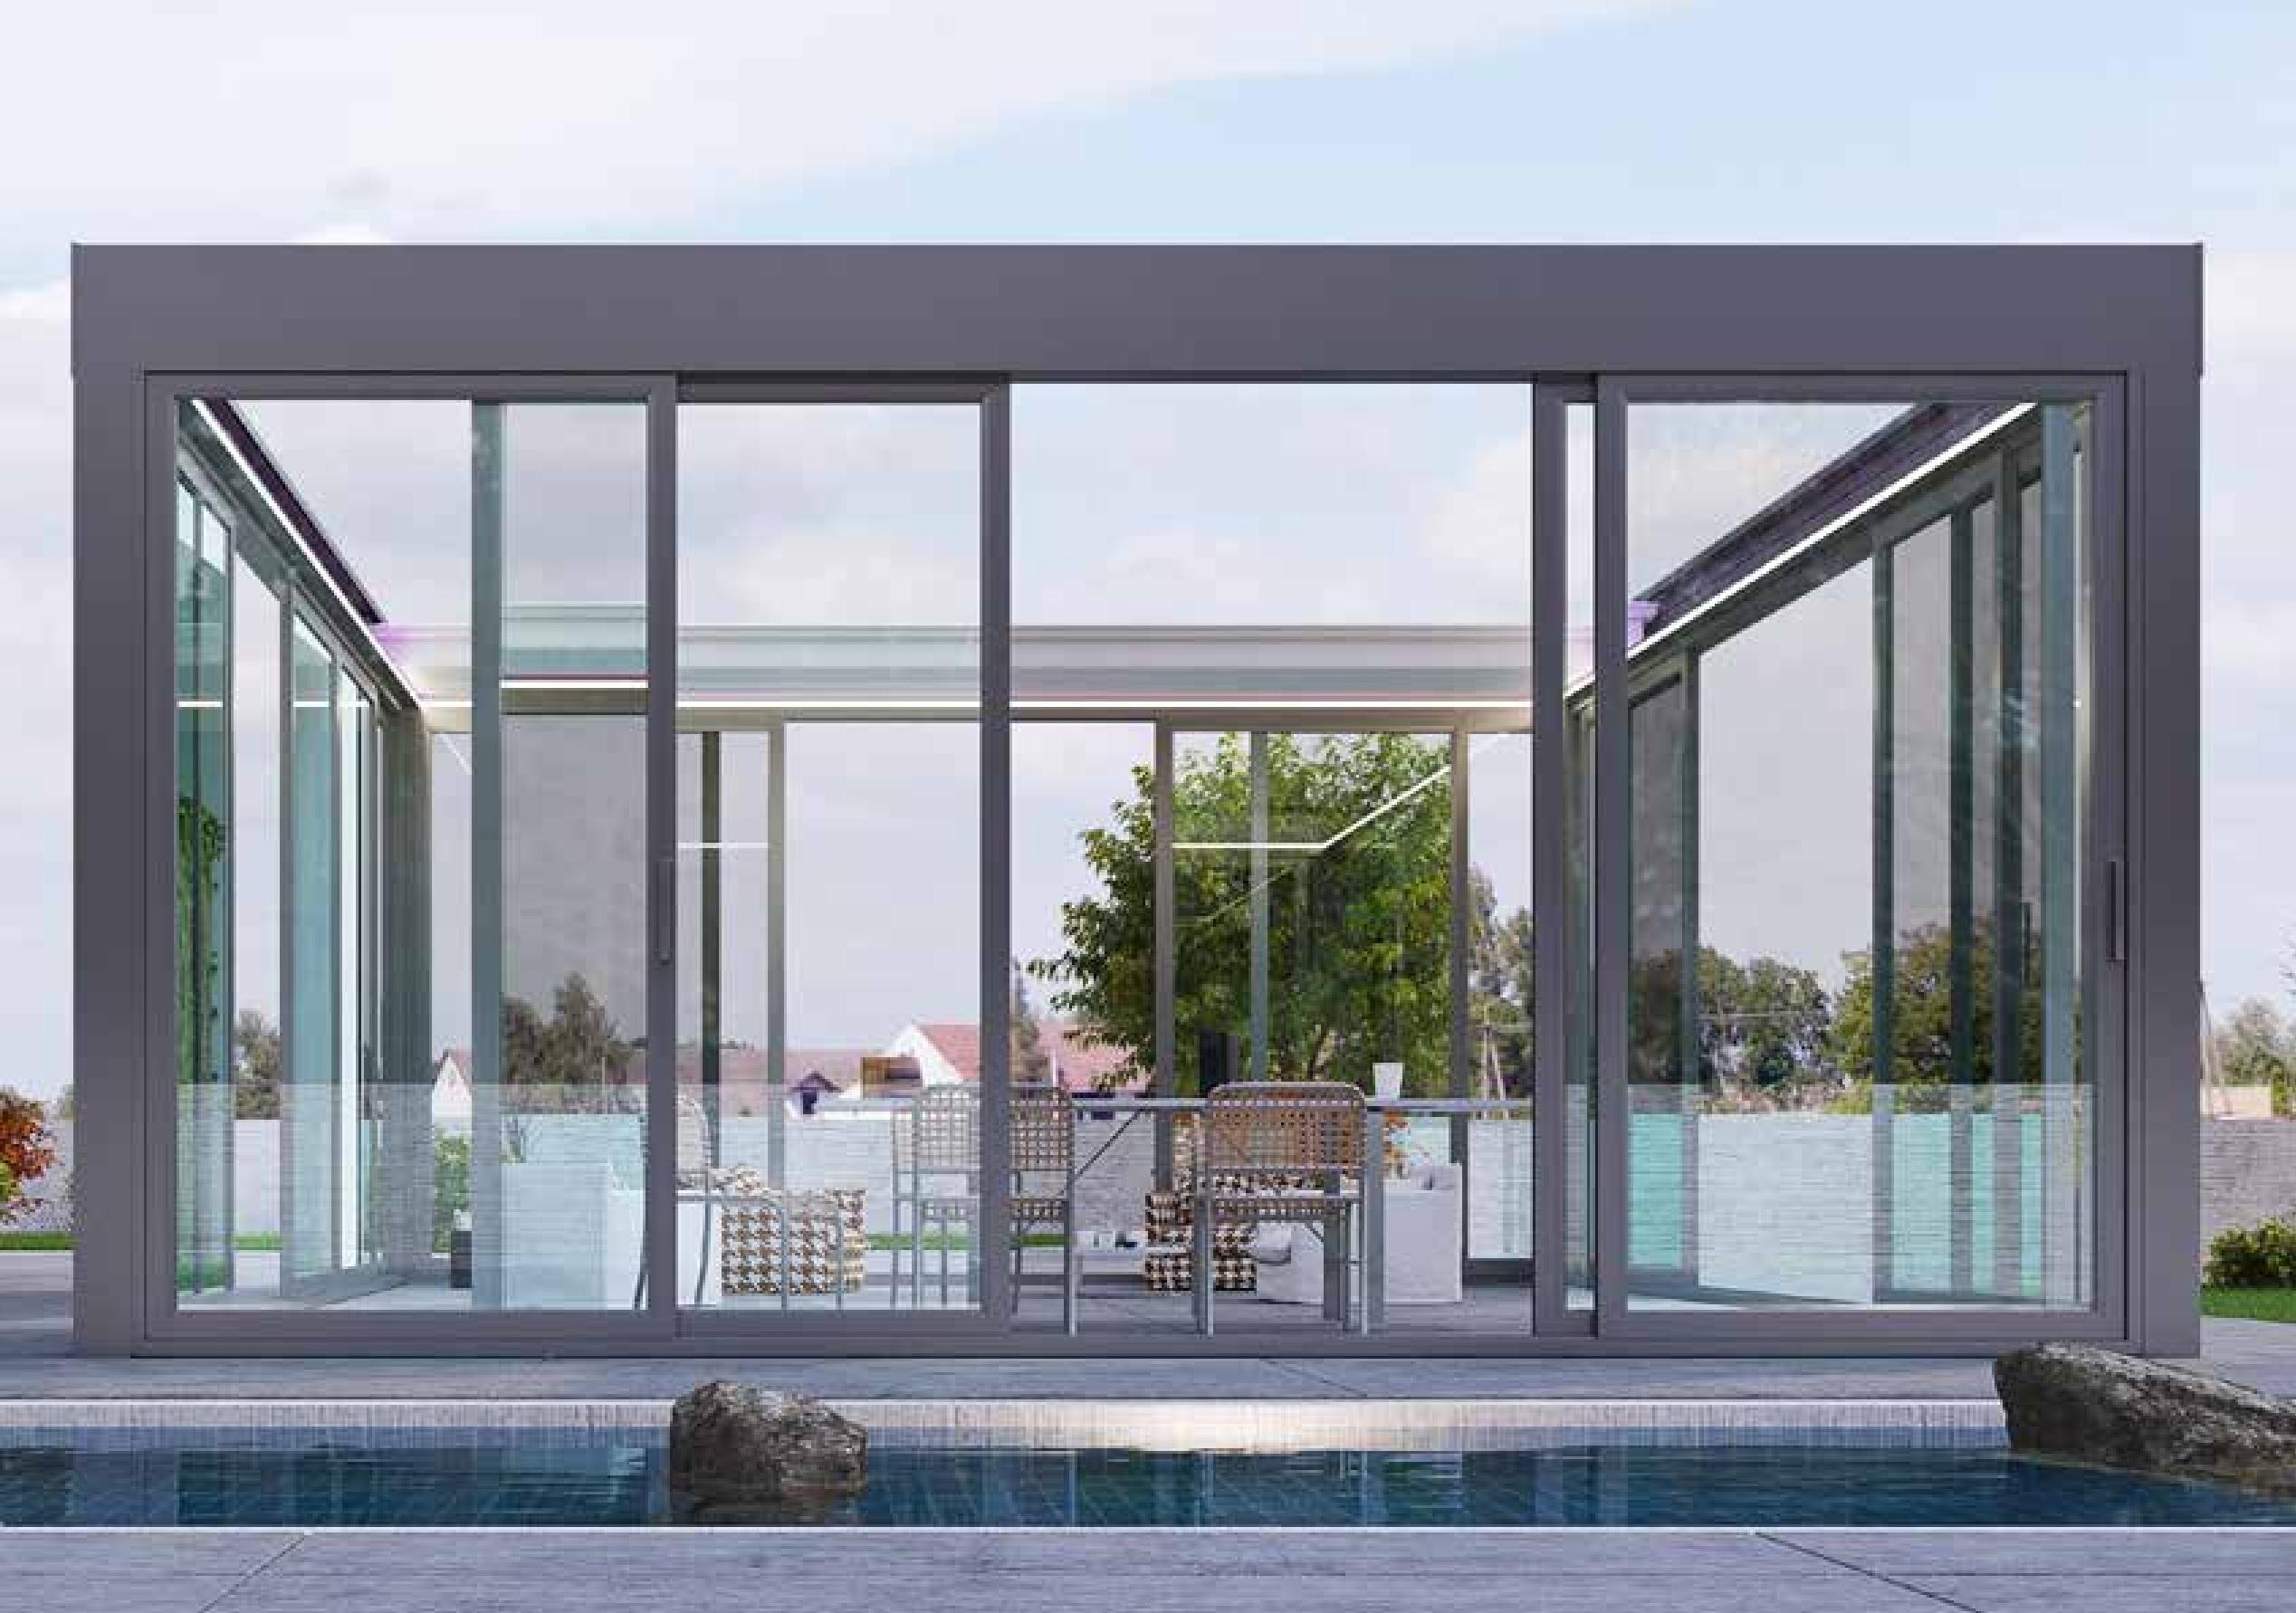 Pergola Bioclimatica Pergole de Lux. Cum sa ai o terasa pregatita pentru iarna cu pergola si sticla. terasă pregătită pentru iarnă cu pergolă și sticlă